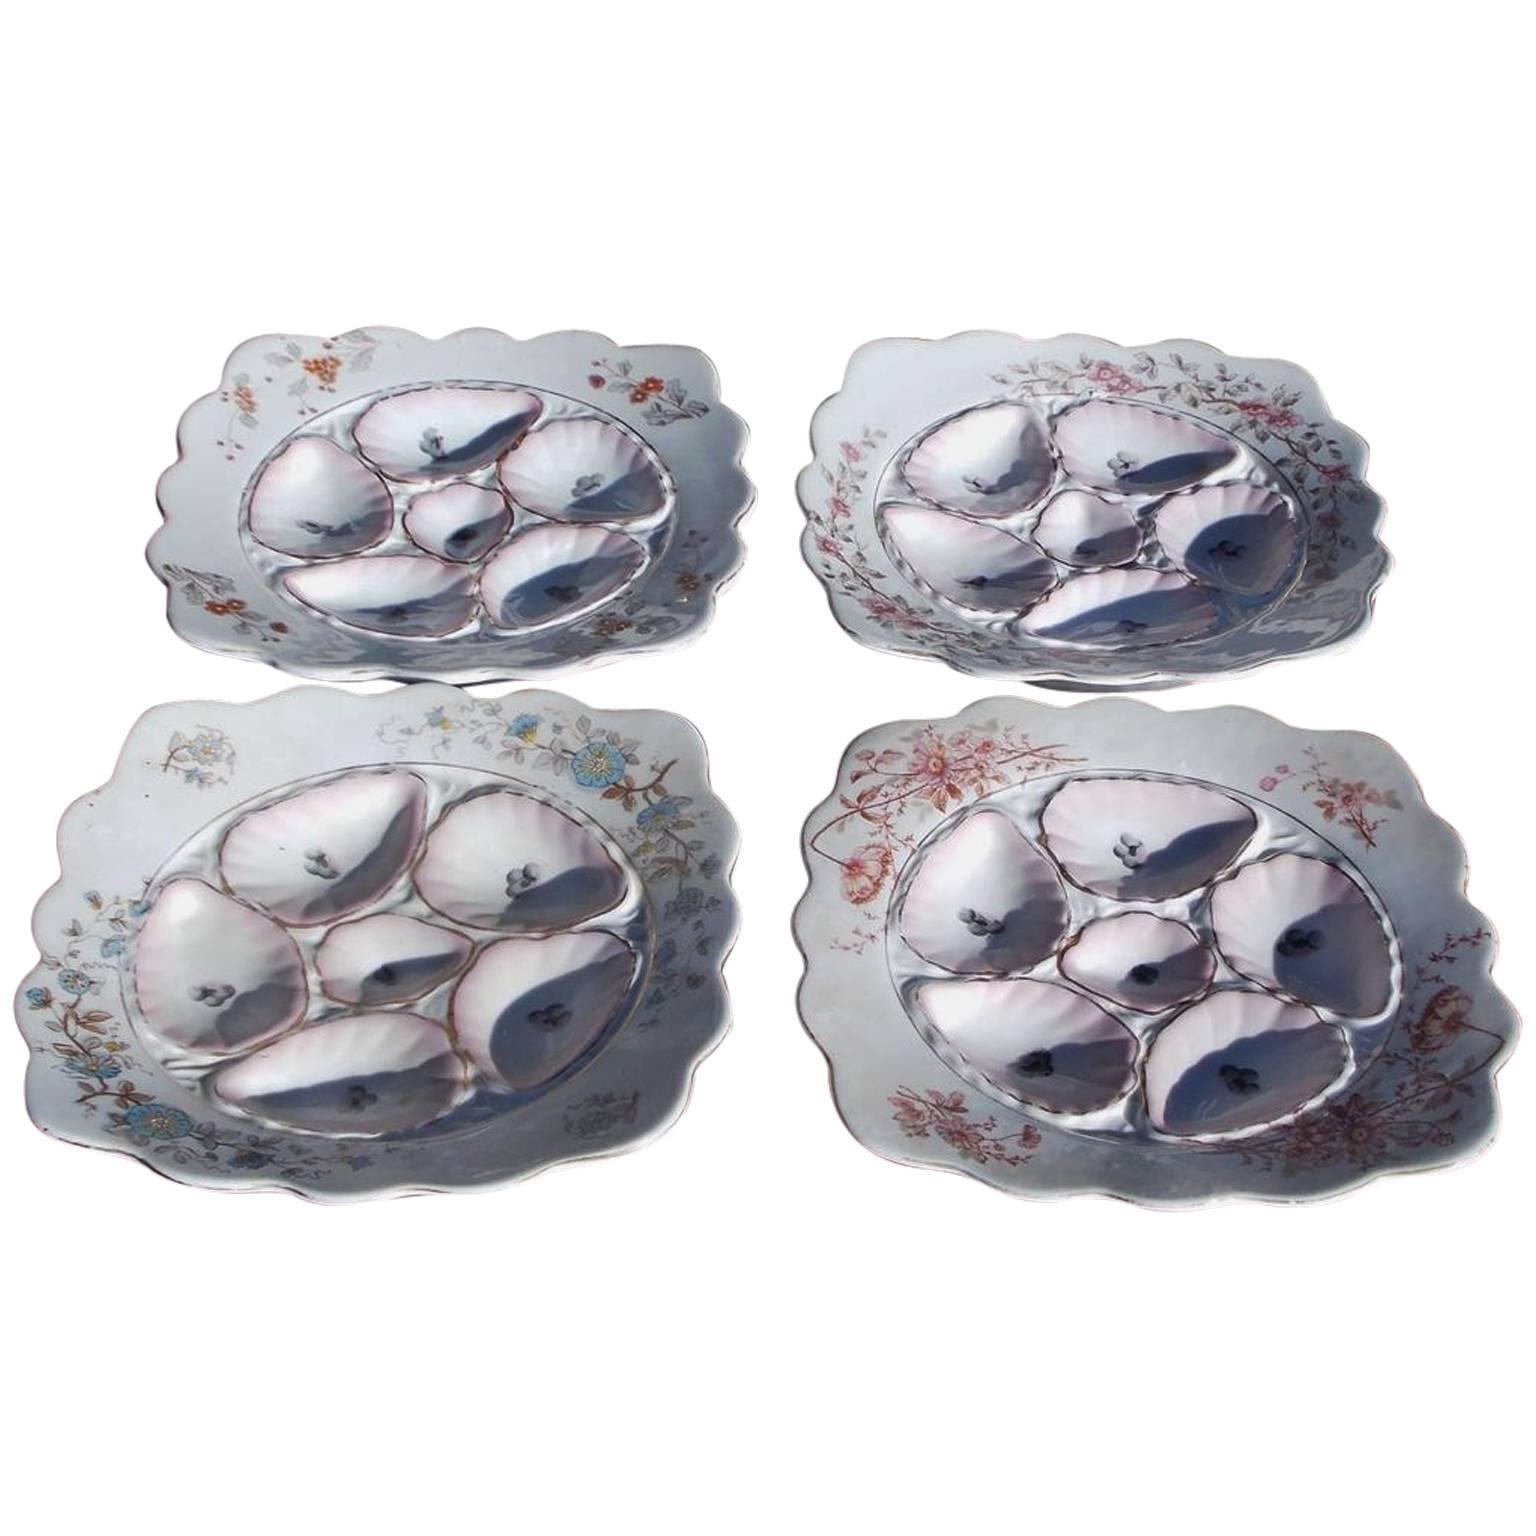 Set of Four Austria Porcelain Oyster Plates, Marx Gutherz, Carlsbad, Circa 1900